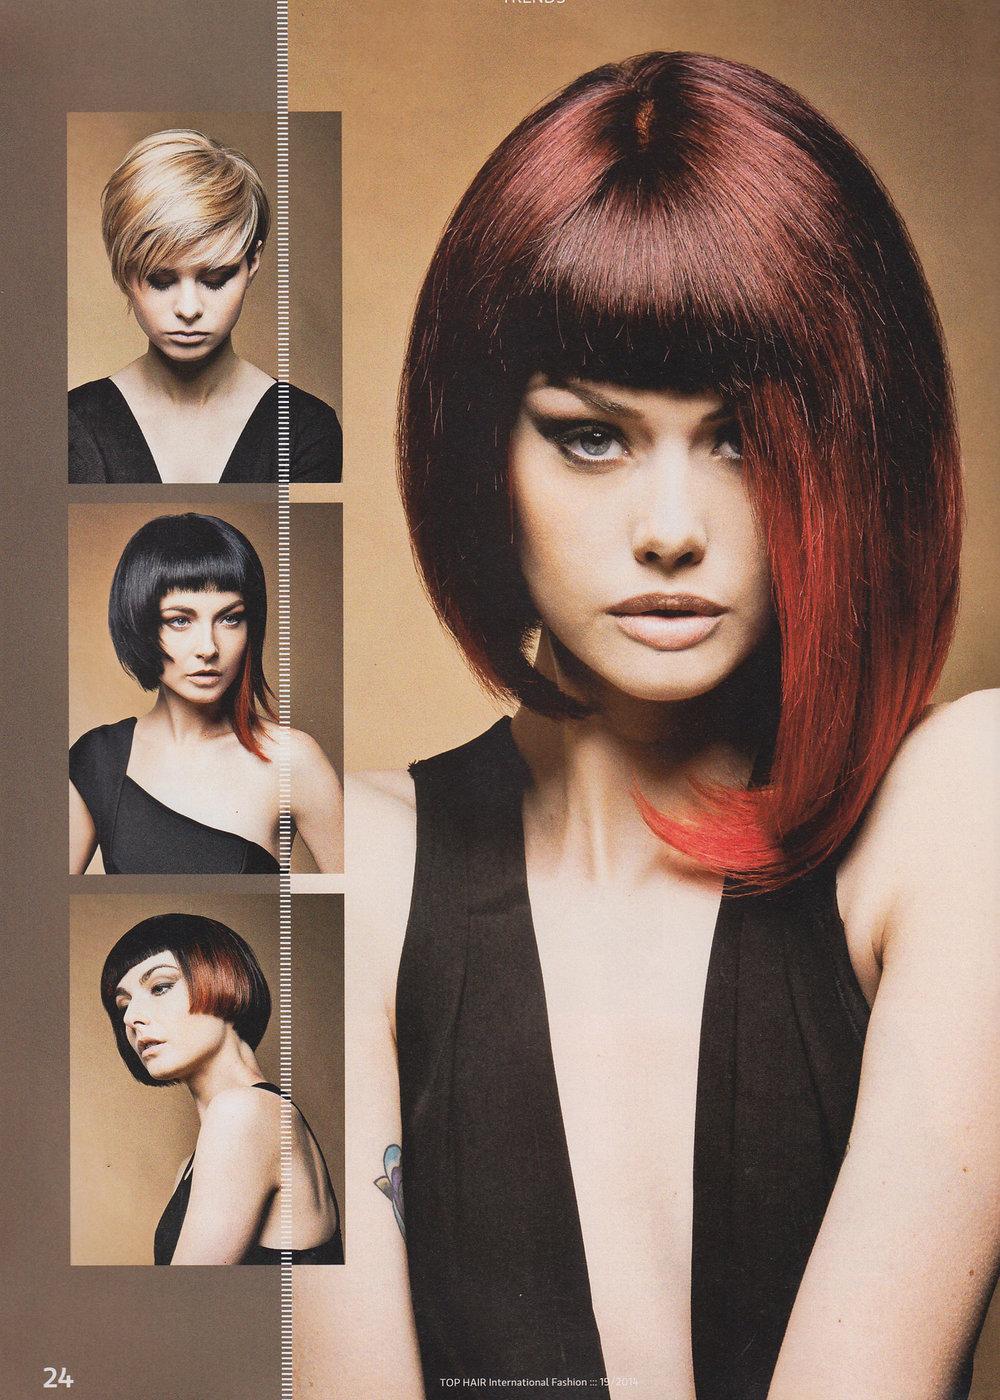 yoshikohair_stkilda_melbourne_hairdresser_hairsalon_tophair15_2